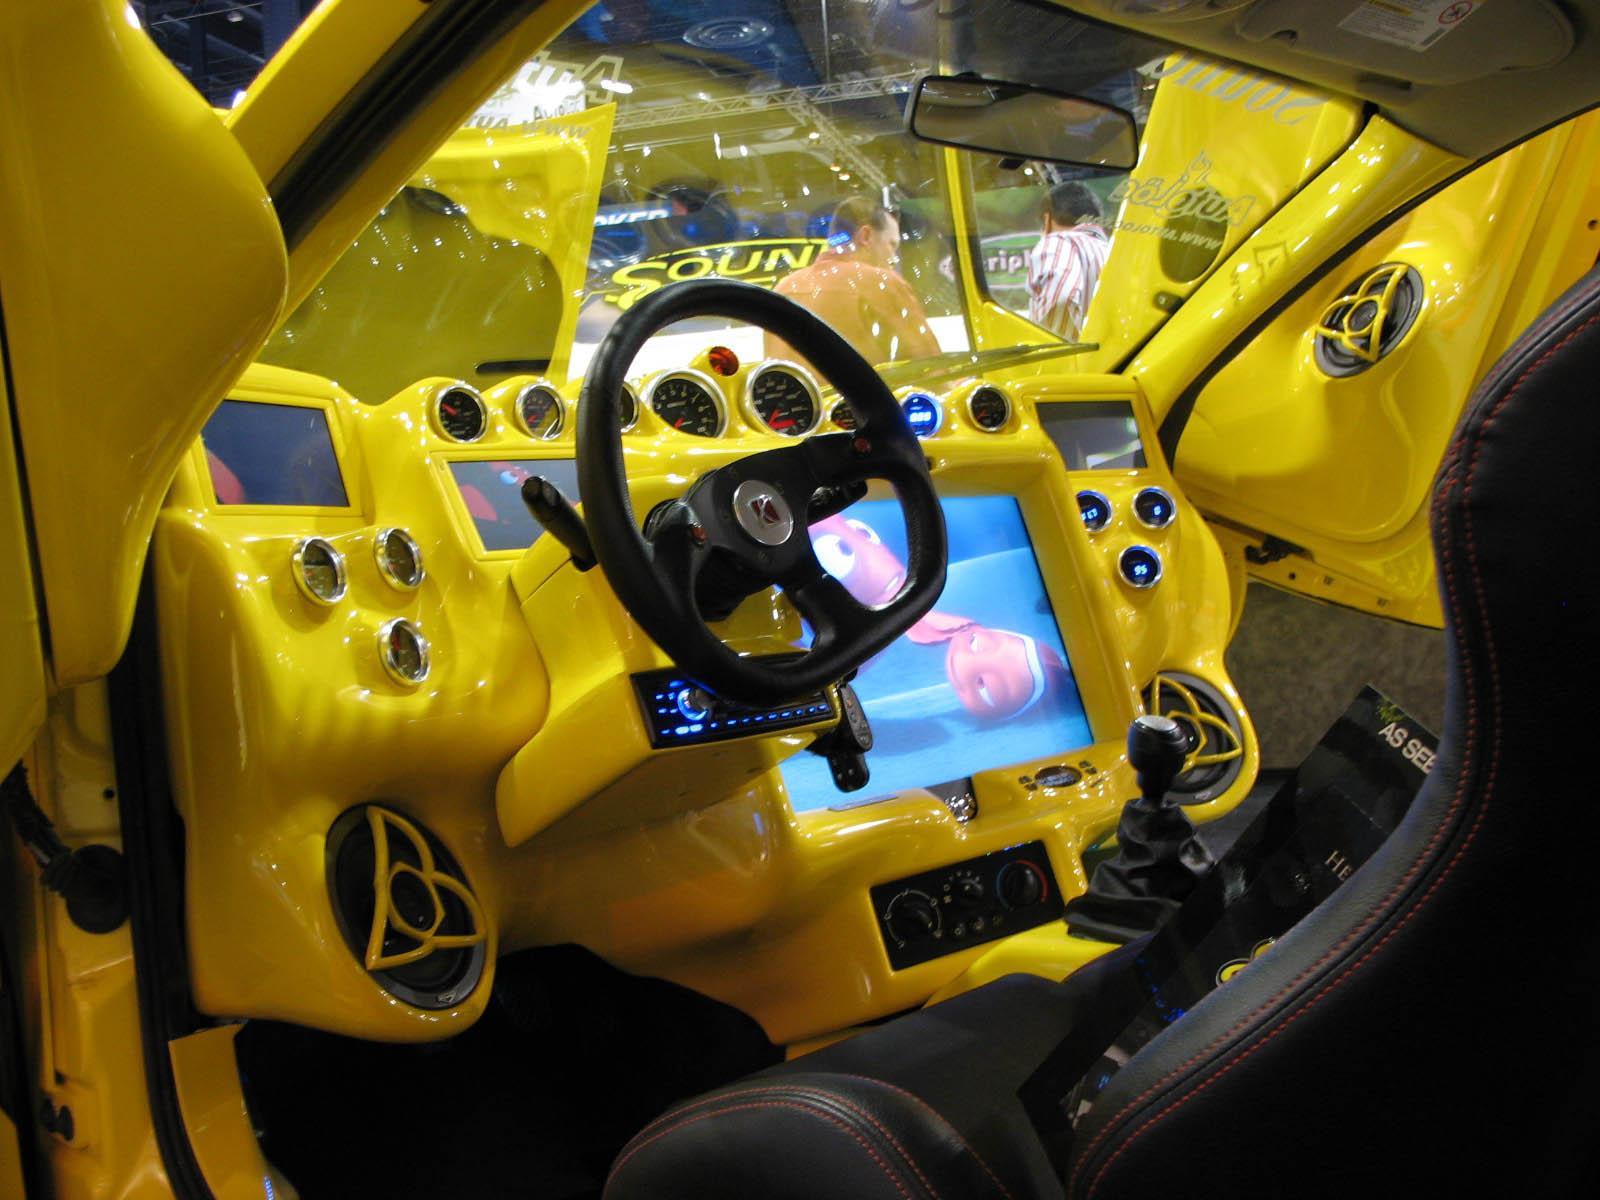 imajenes de carros tuning: